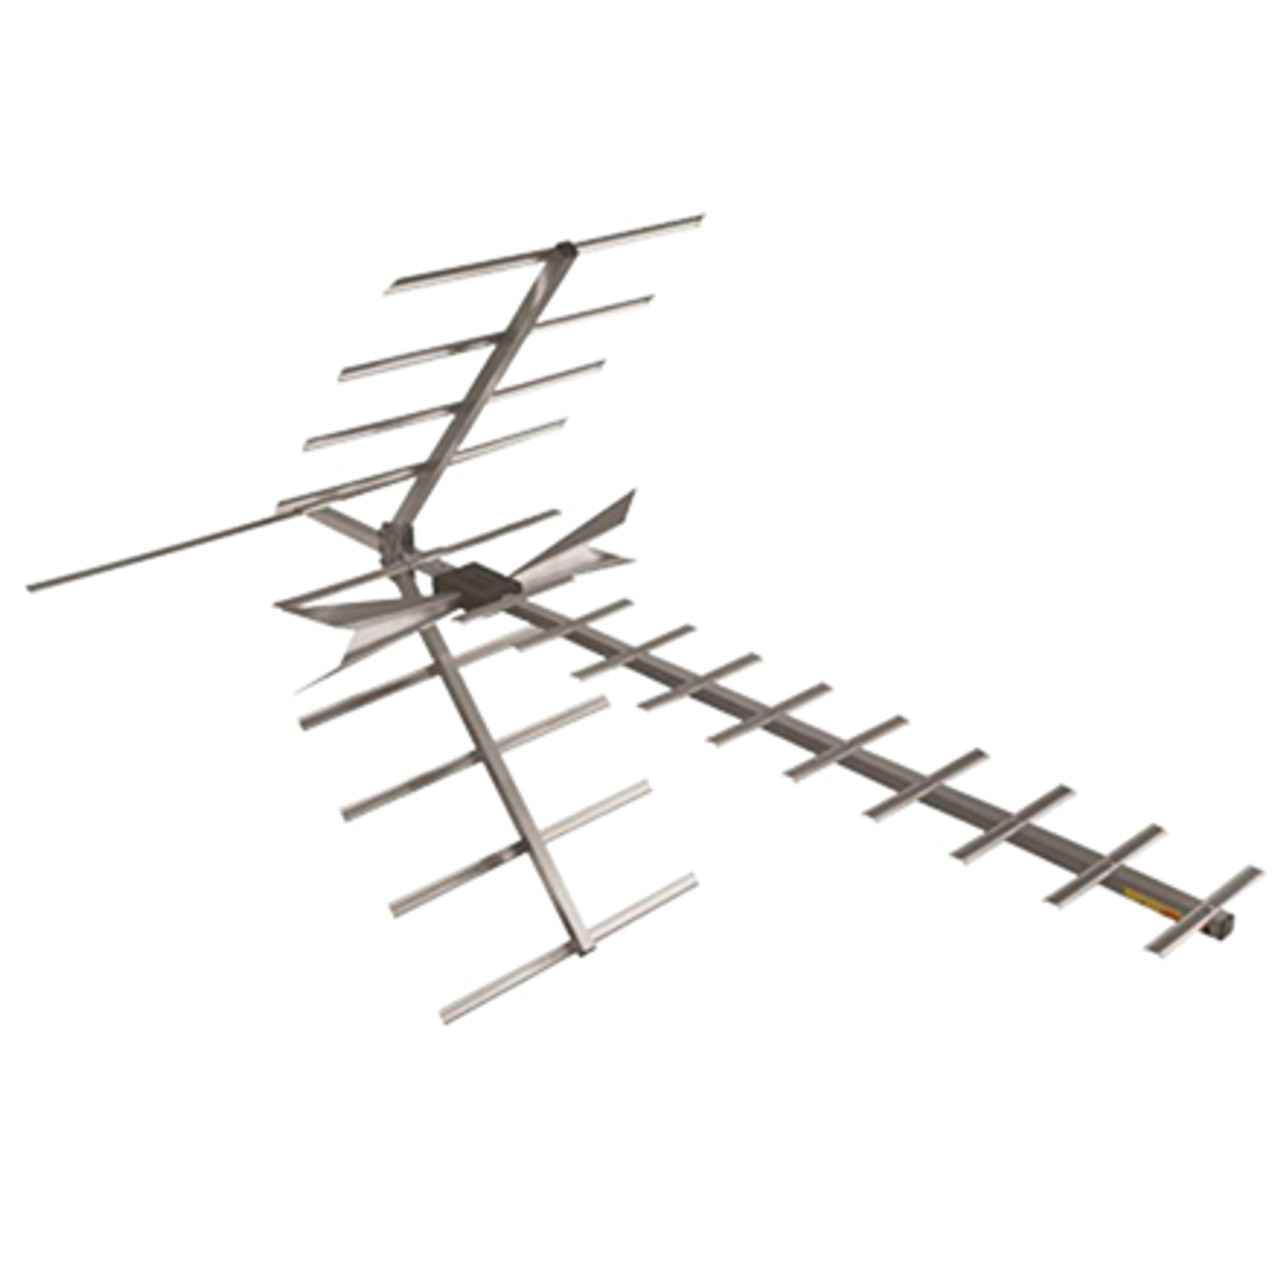 DigiTenna® DT-DFAMP20-1 Deep Fringe Antenna w/ Embedded Amplifier VHF Hi-Band/UHF, 0-70+ Miles